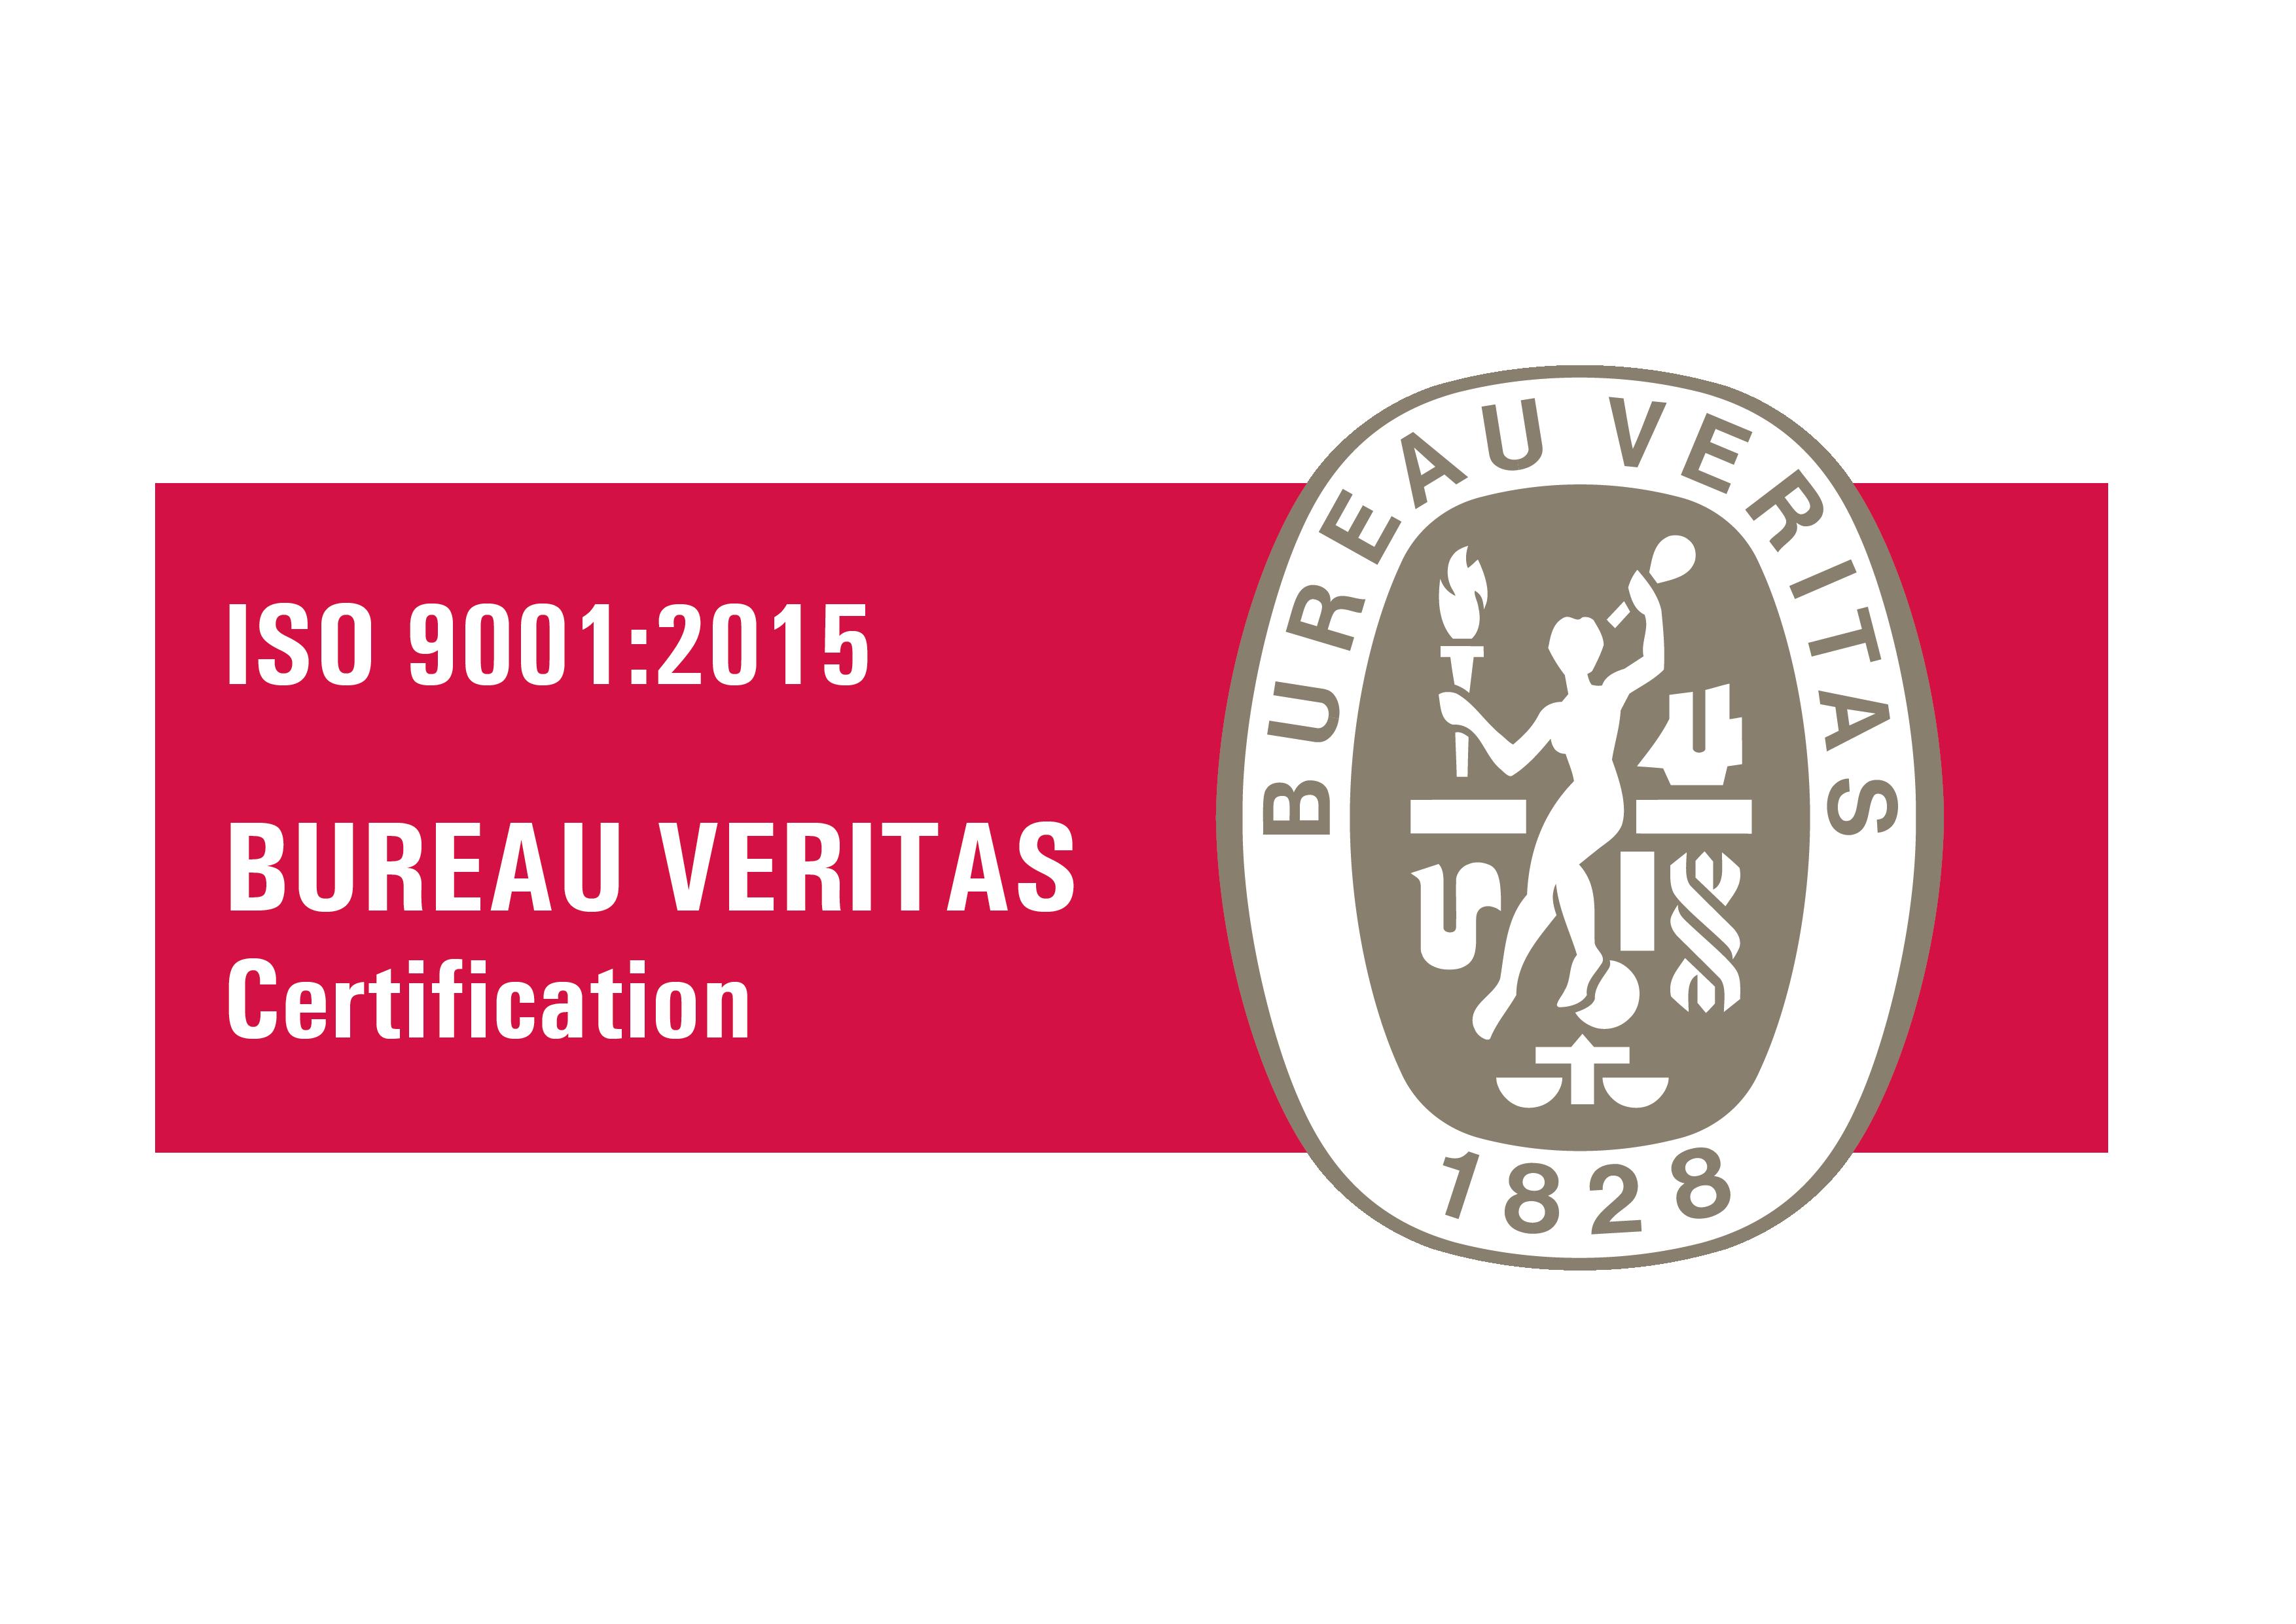 Vortex Fire Dubai awarded ISO 9001:2015 certification